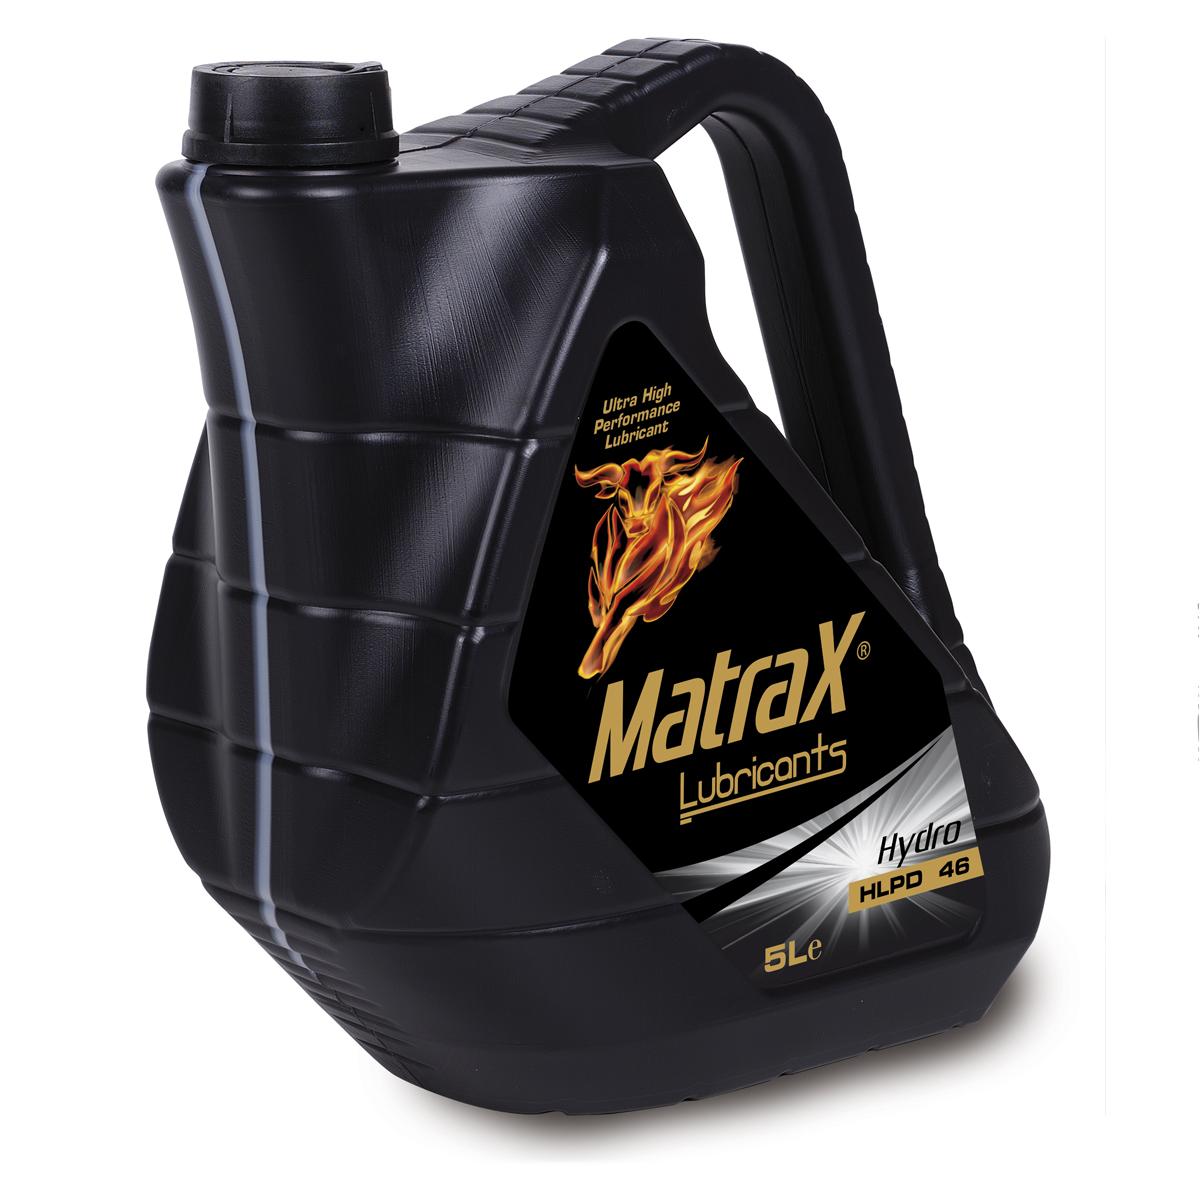 MatraX Hydro HLPD 46